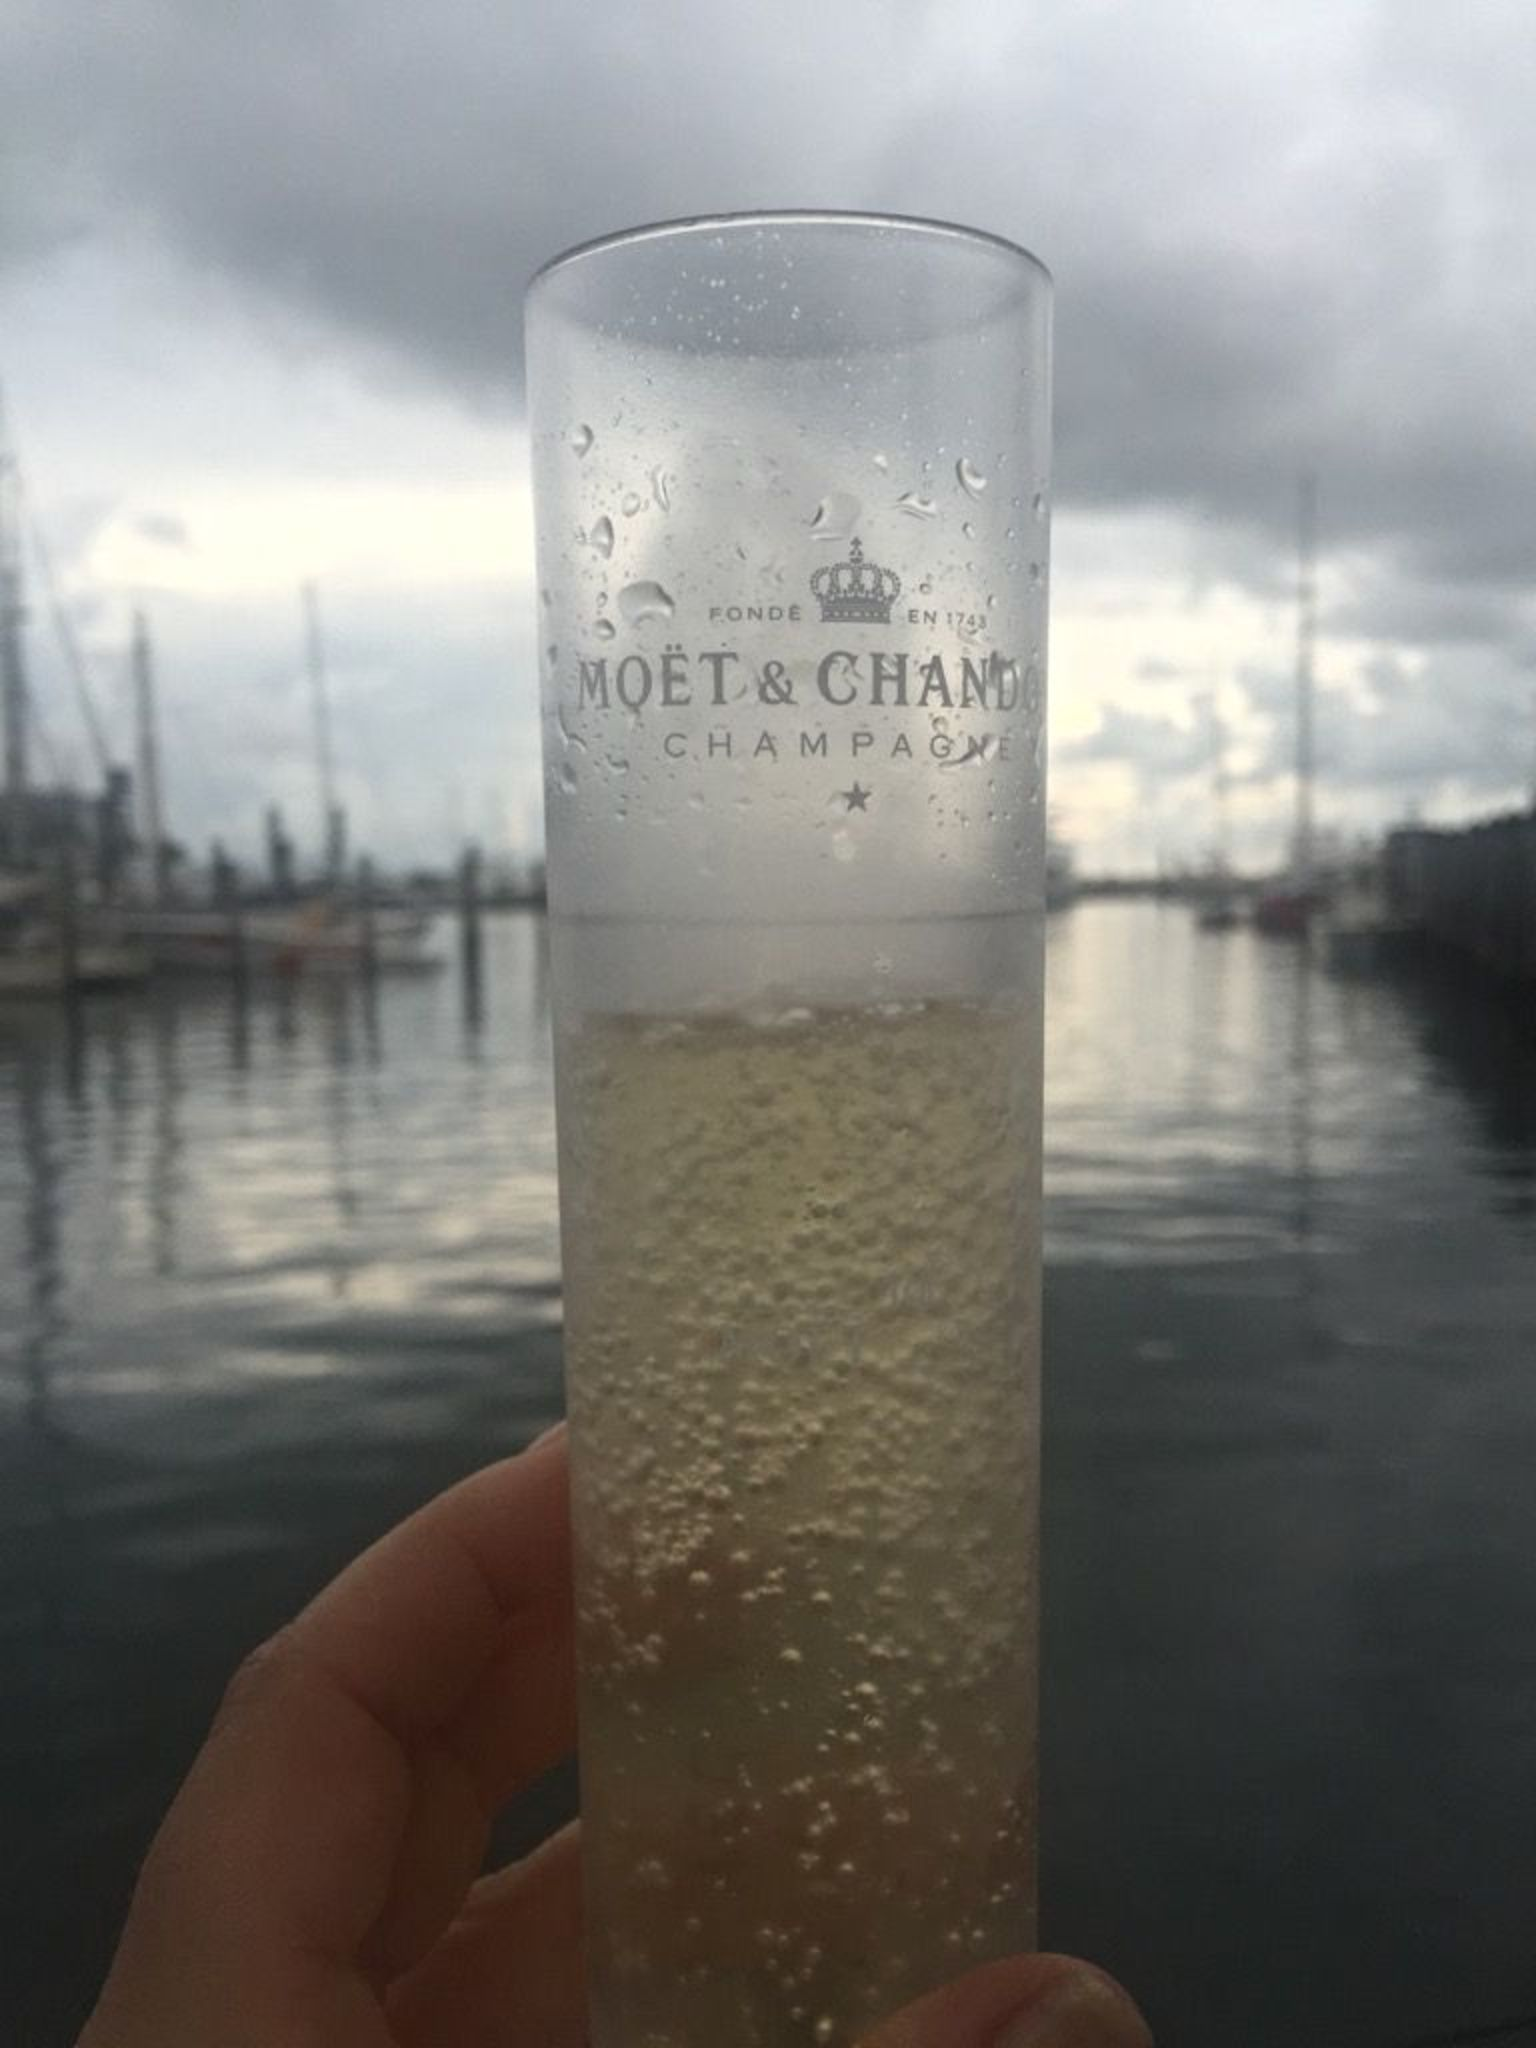 MÁS FOTOS, Crucero al atardecer con celebración con champán